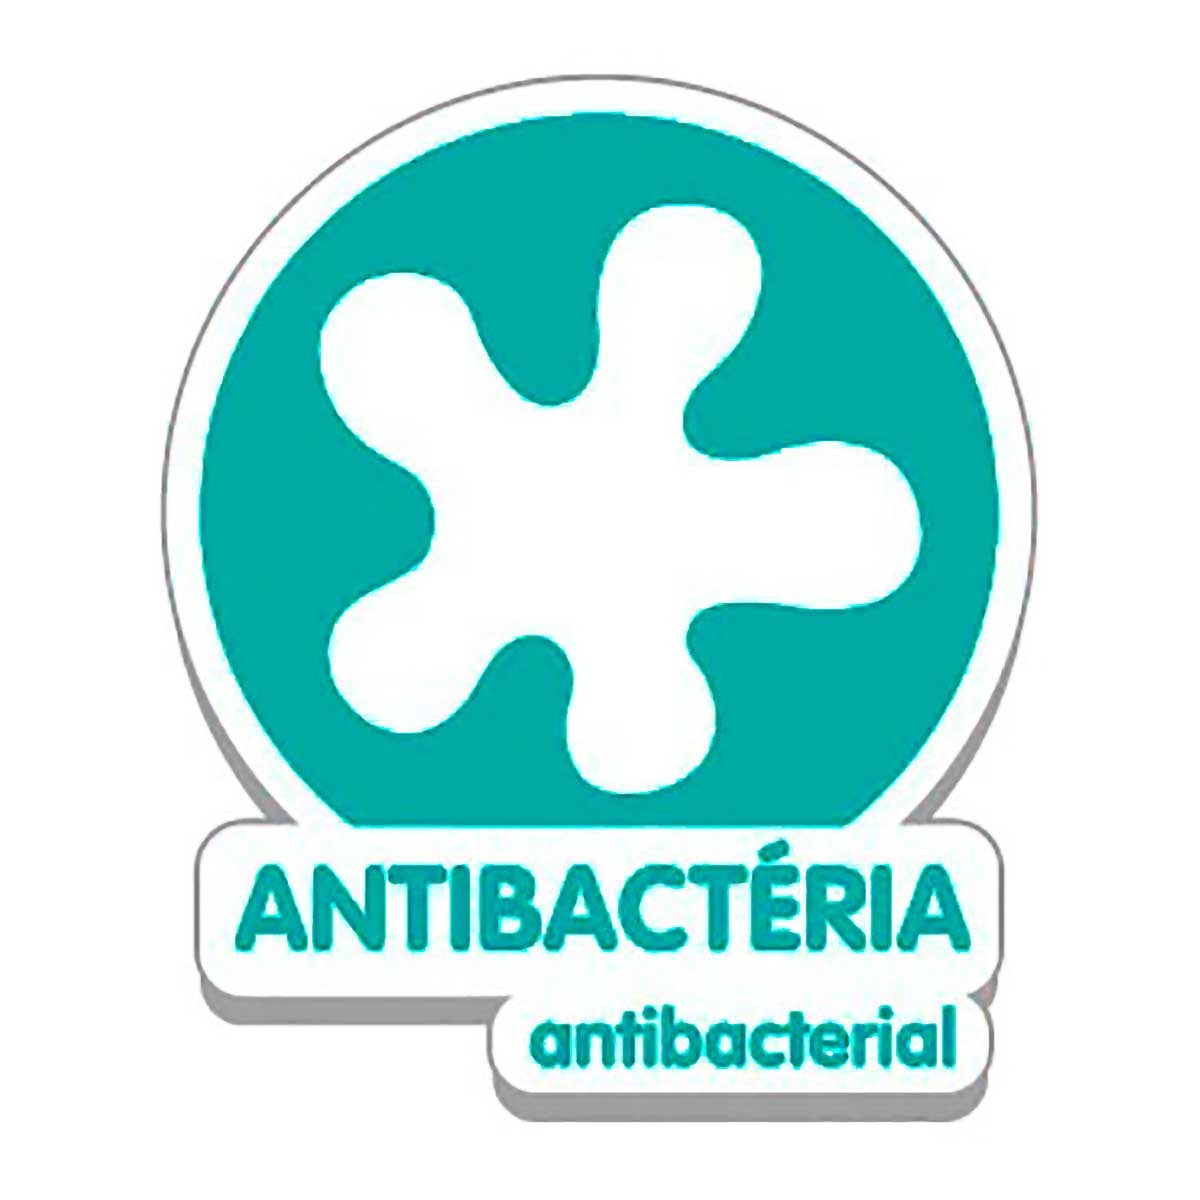 Kit 15 Potes Plásticos Moduline Antibactéria